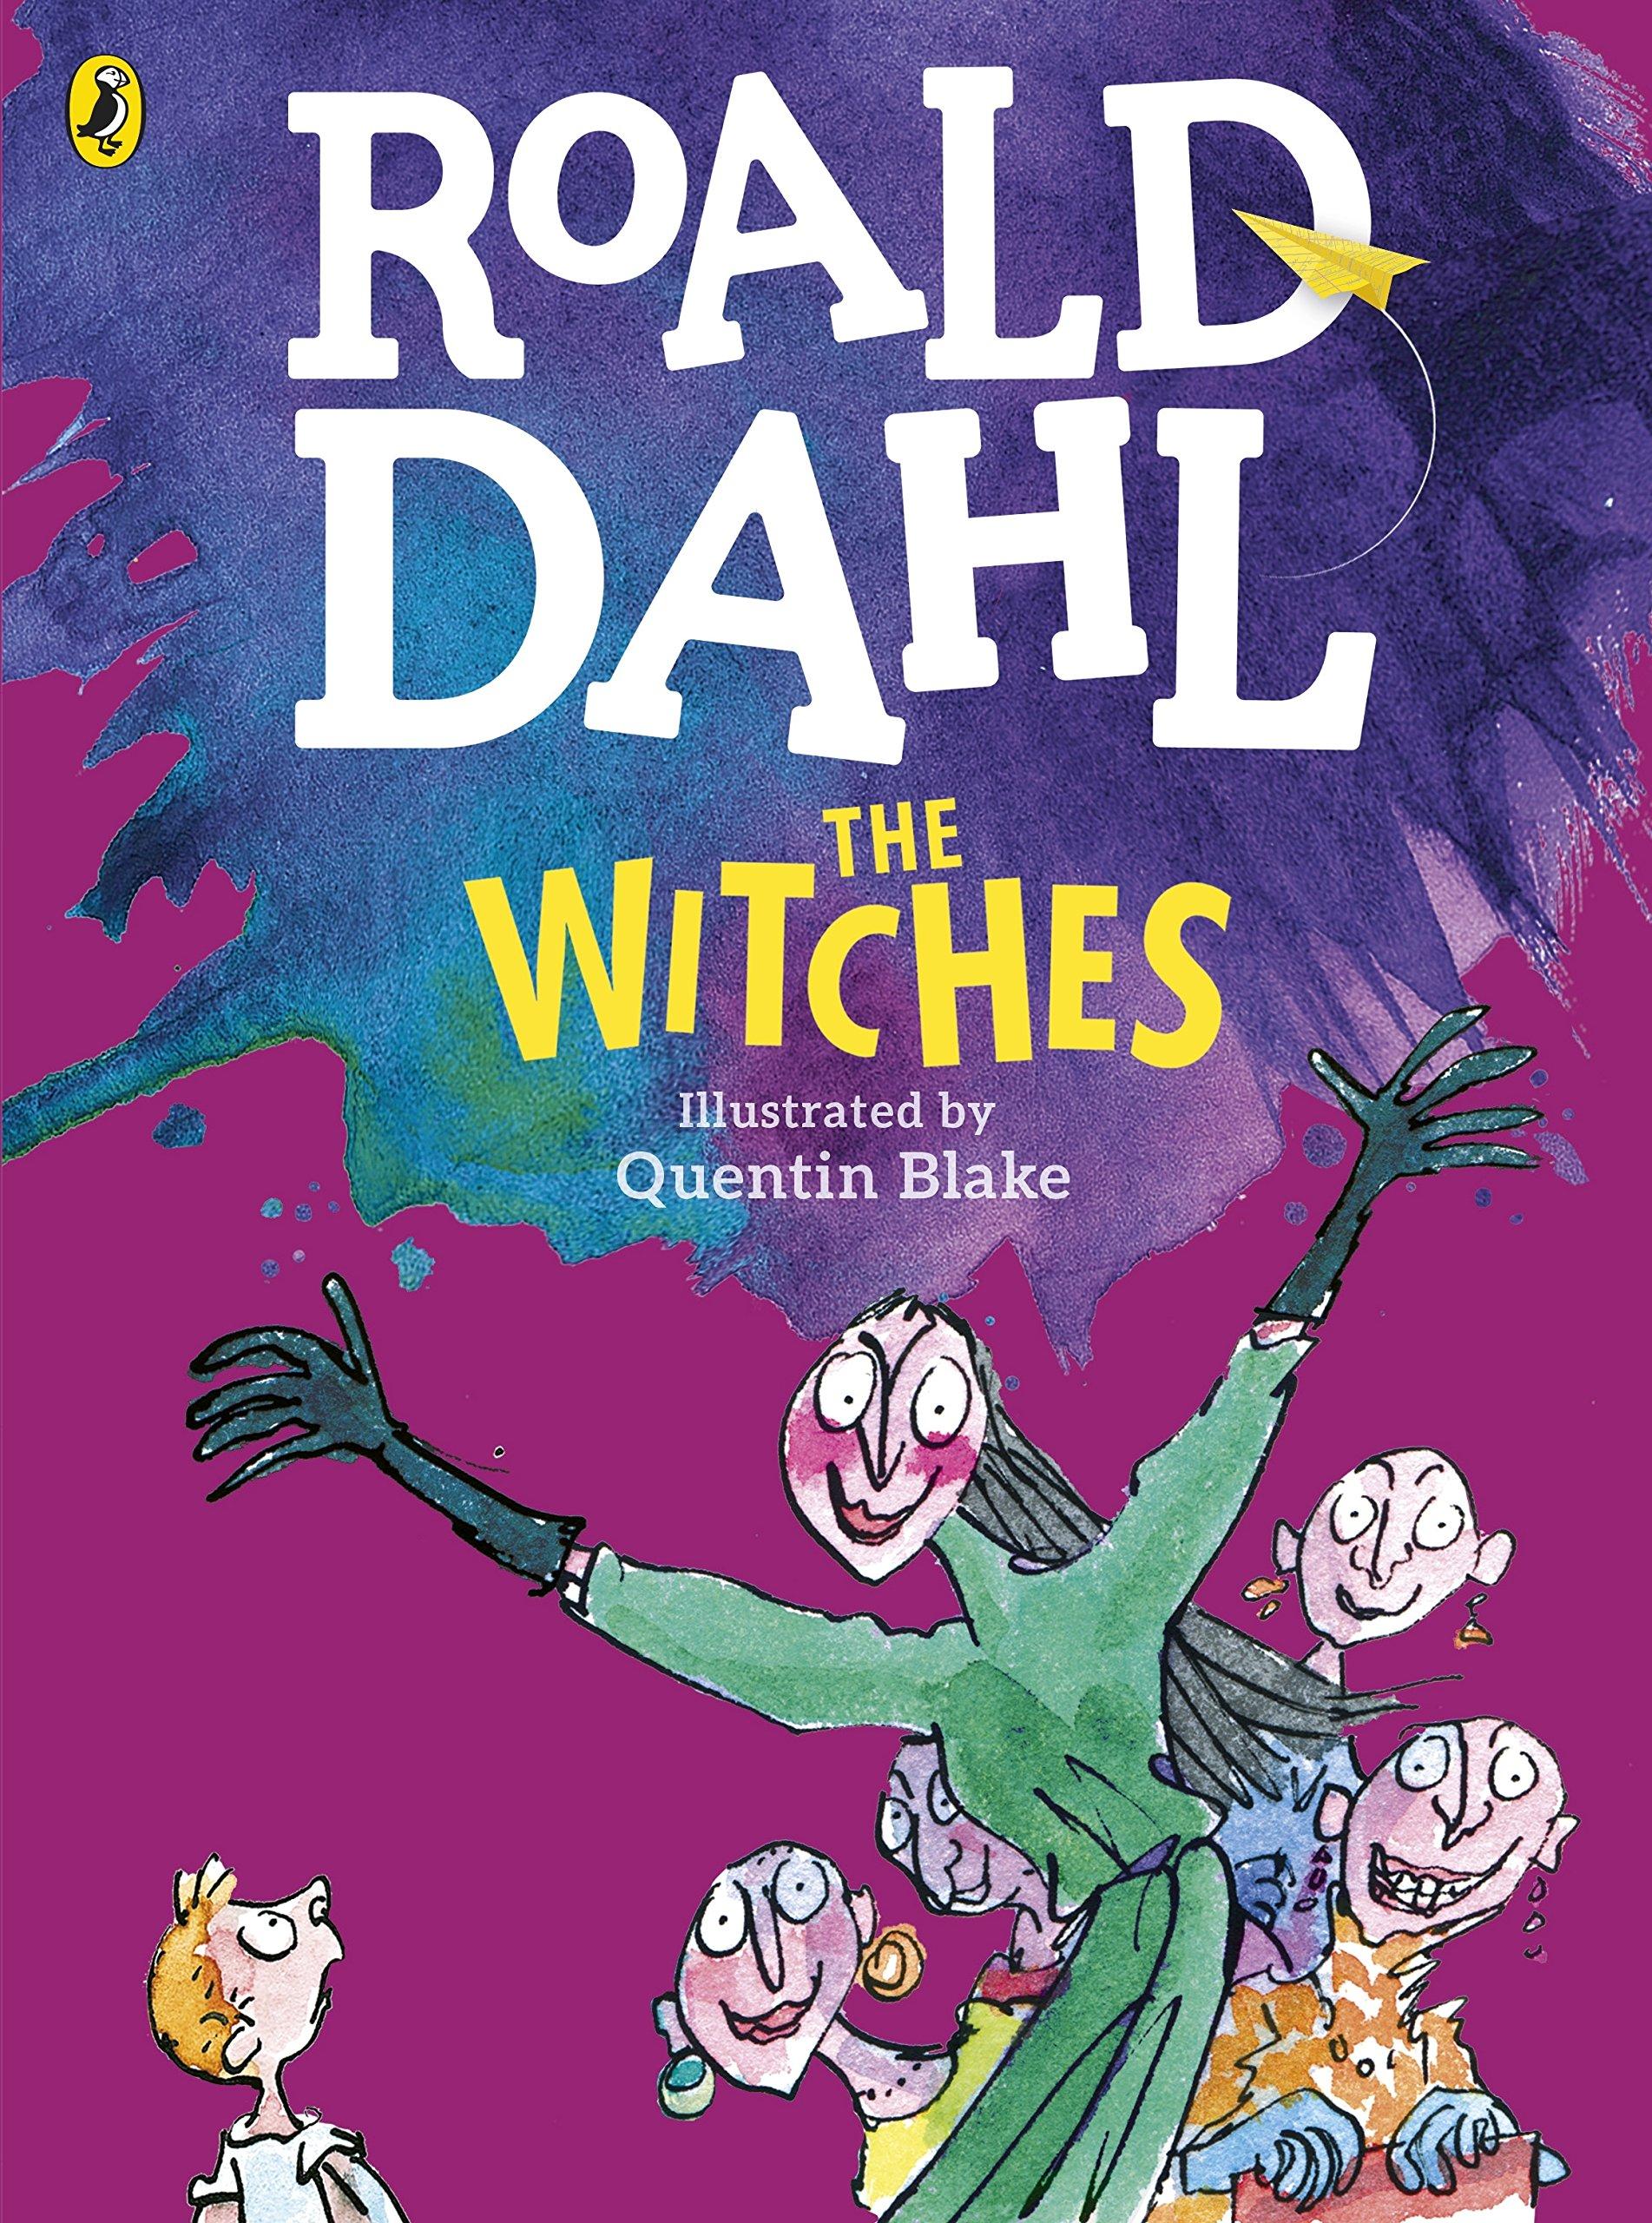 The Witches Colour Edition: ROALD DAHL: 9780141345178: Amazon.com: Books